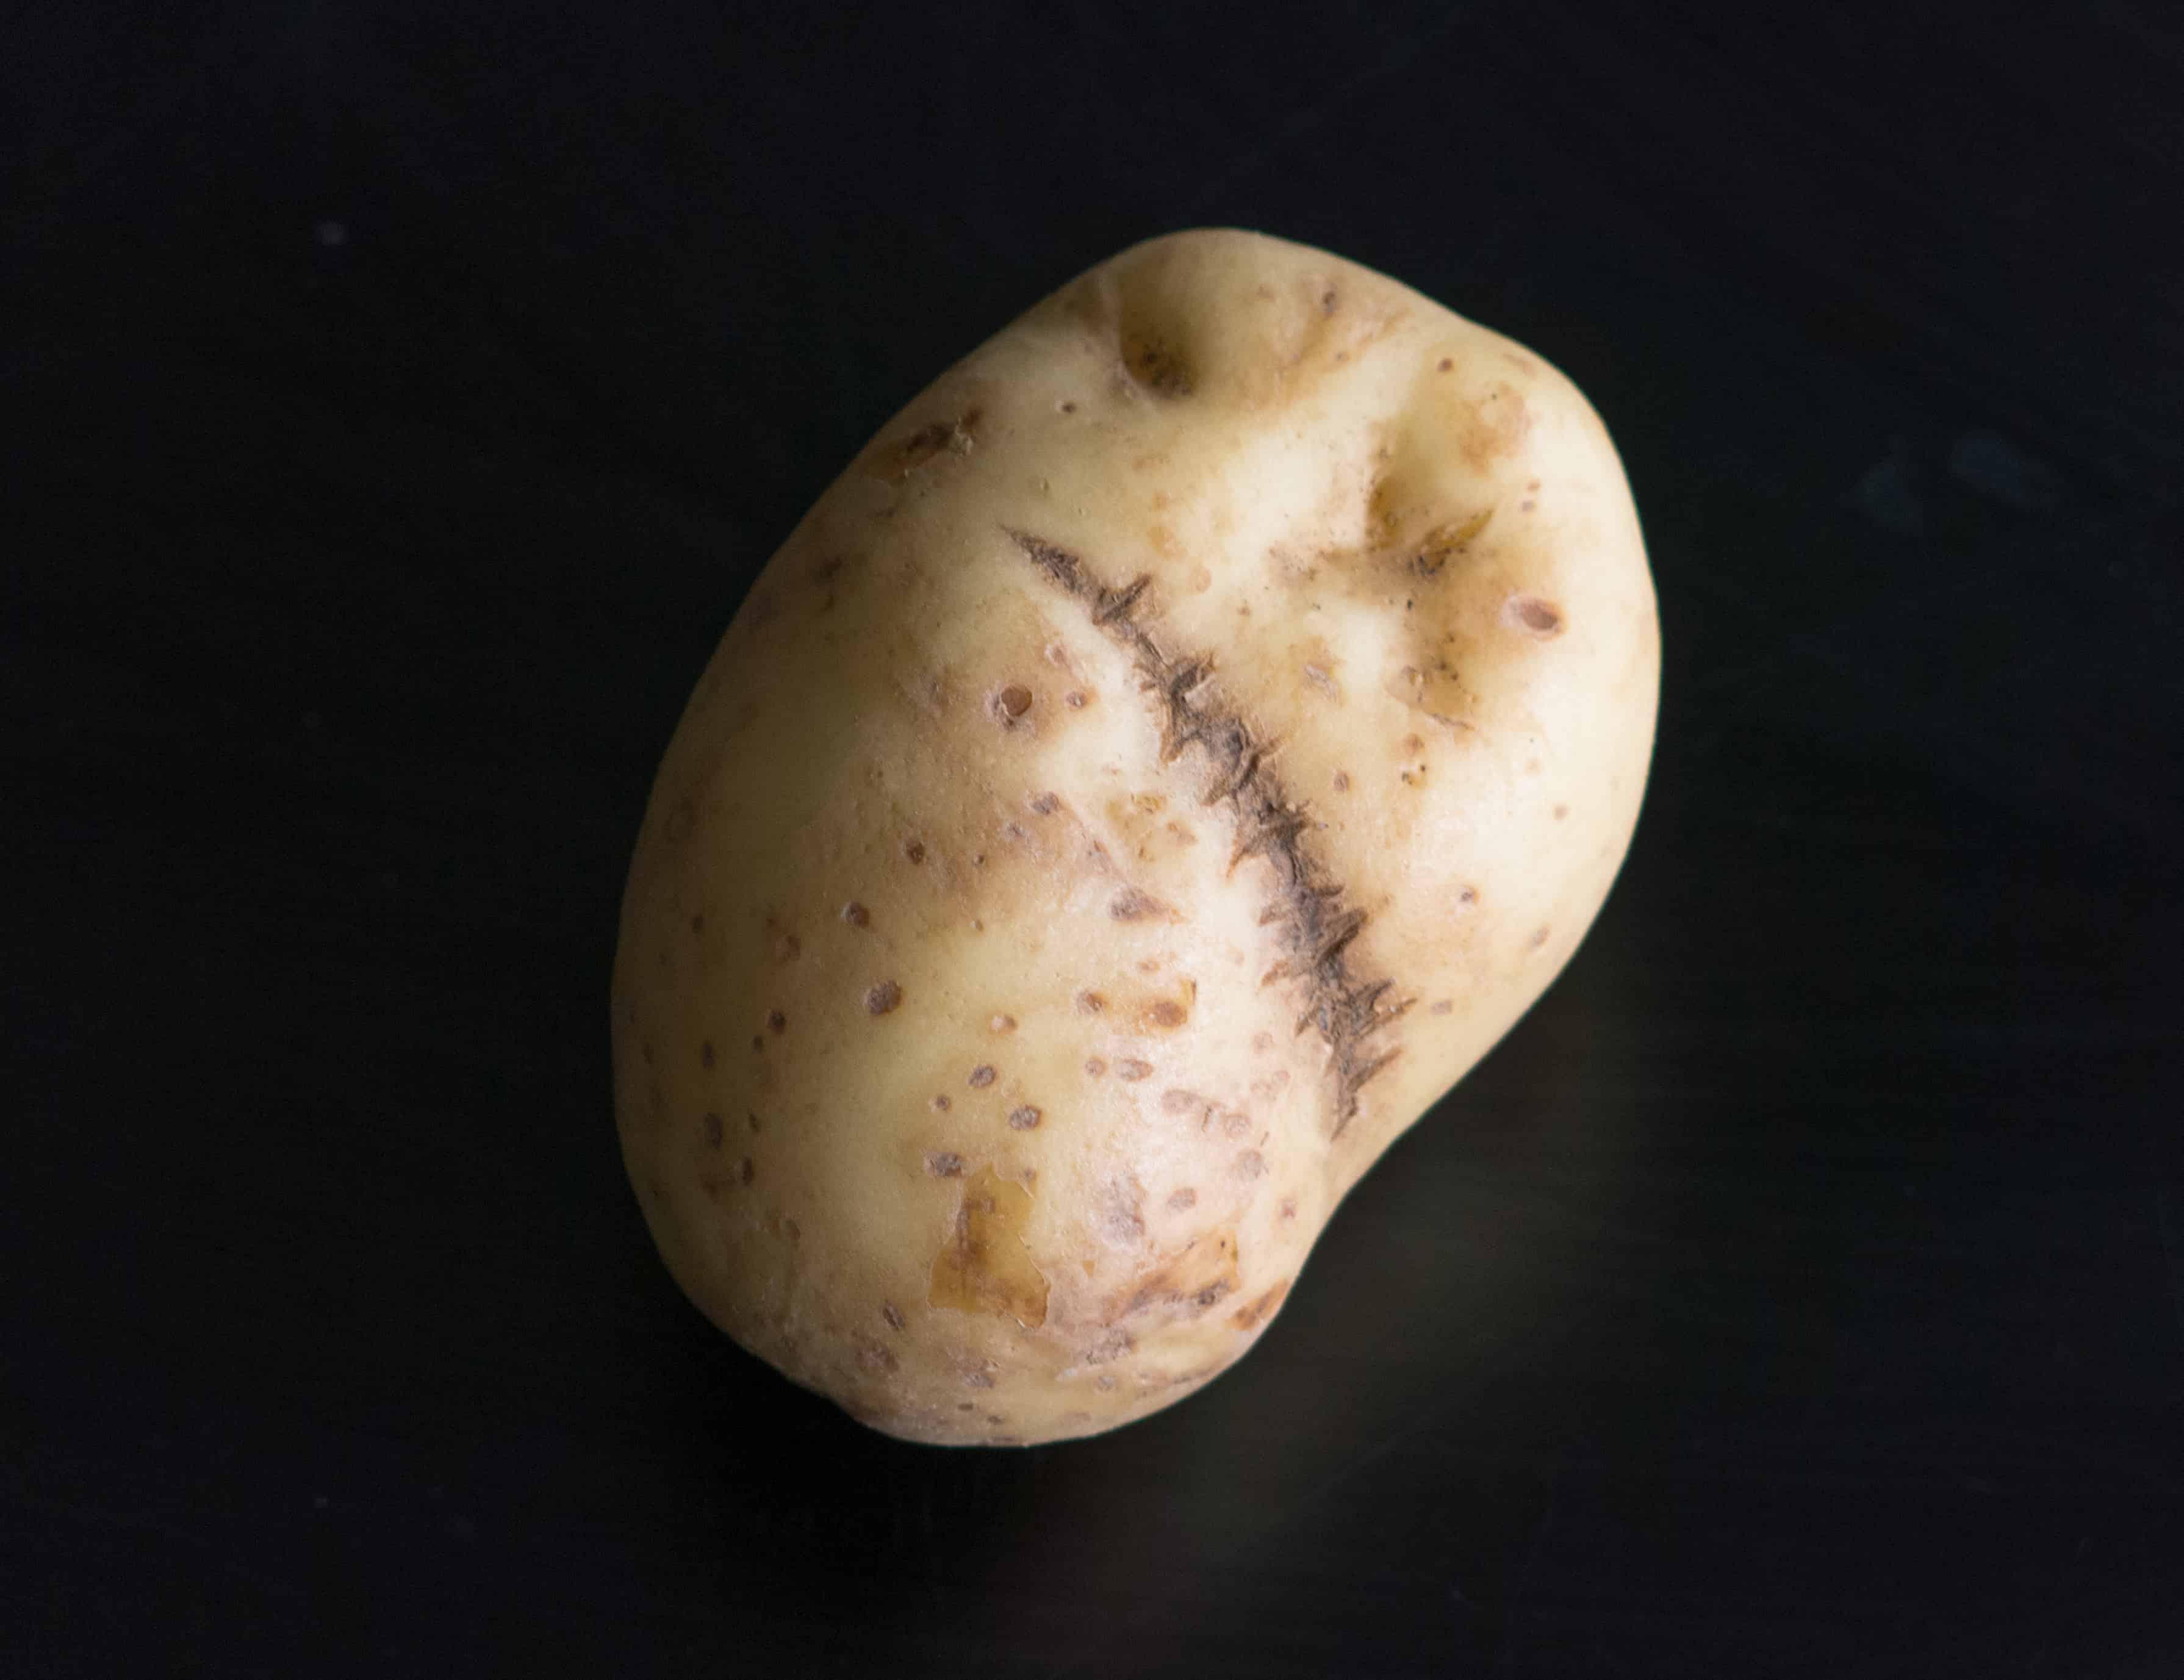 Frankenstein's Potato. A very special, scary, Halloween potato.